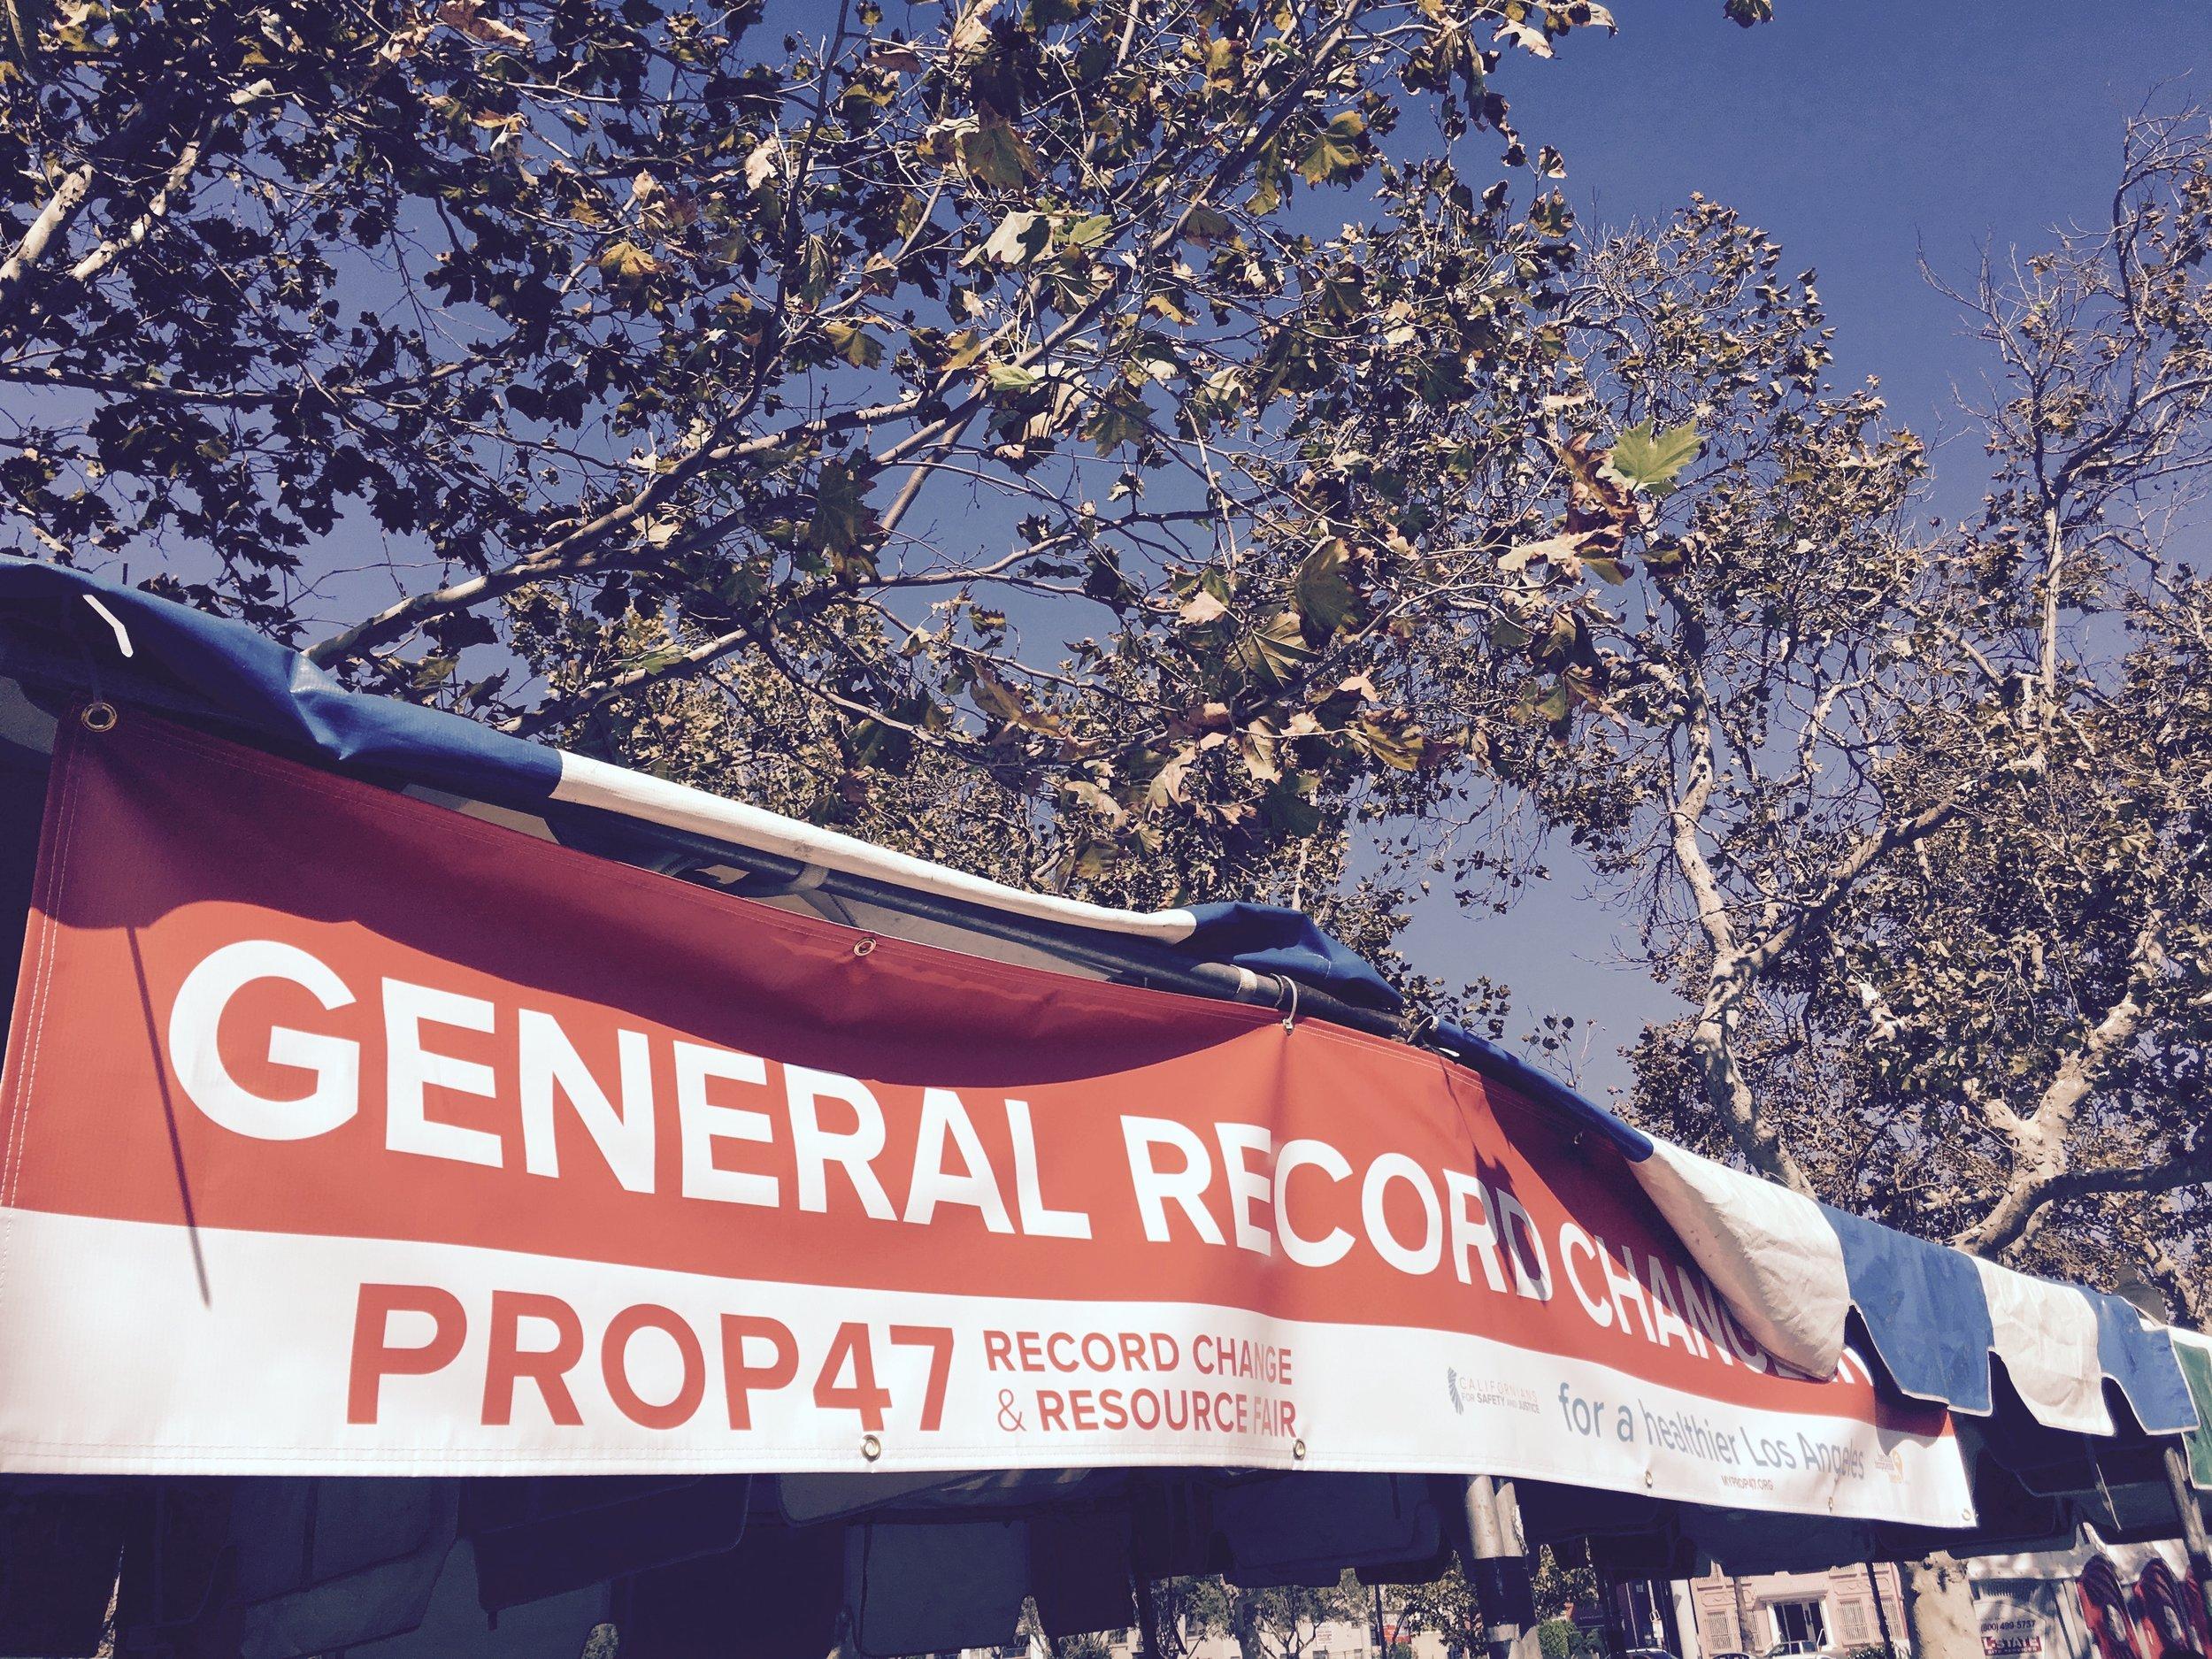 Prop 47 reduces certain low level felonies to misdemenors.